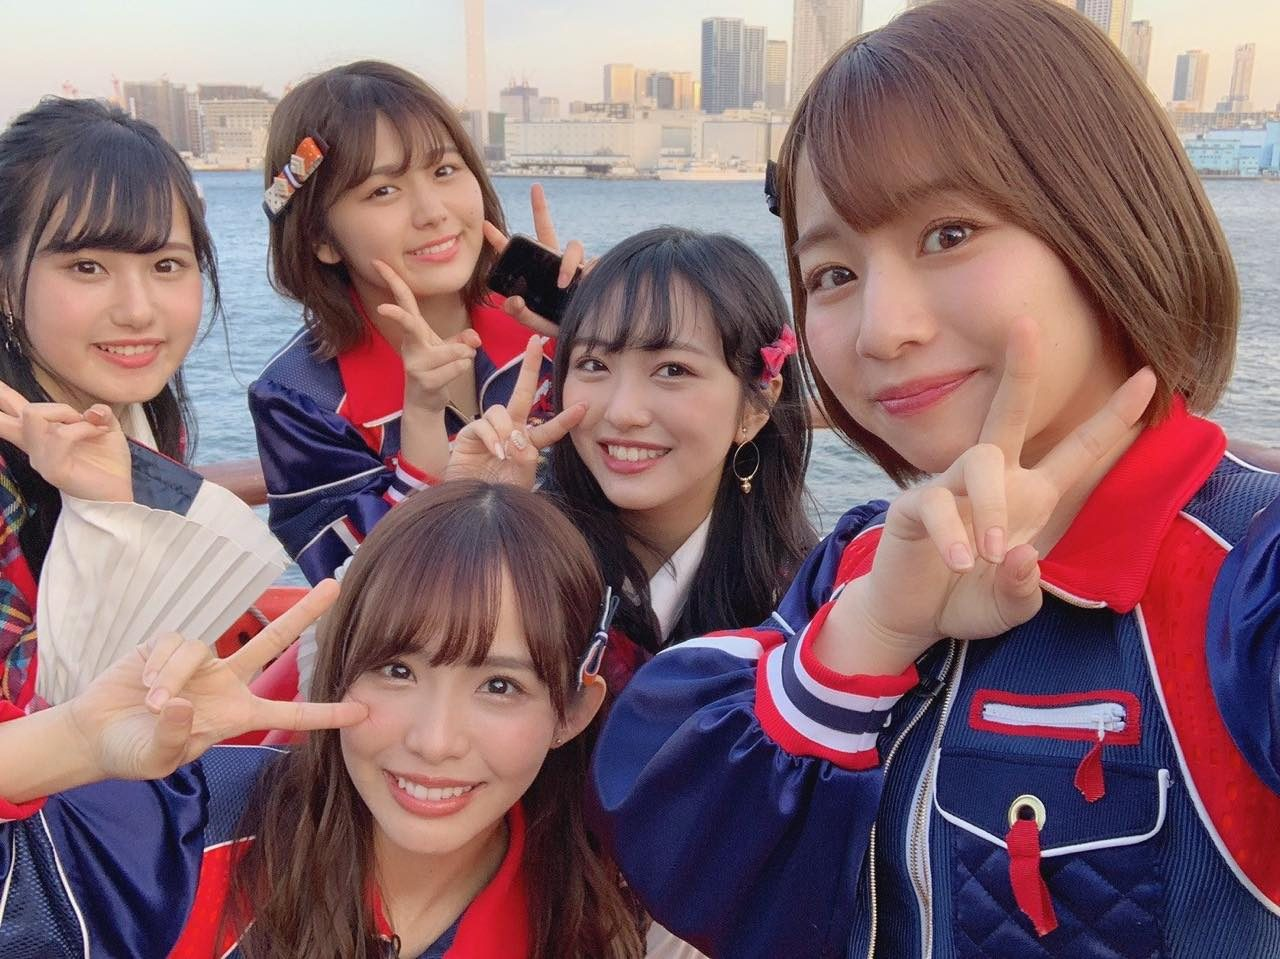 SKE48秋葉原を電撃訪問! フジテレビNEXT「AKB48グループ出張会議!」#4 [4/24 21:00〜]